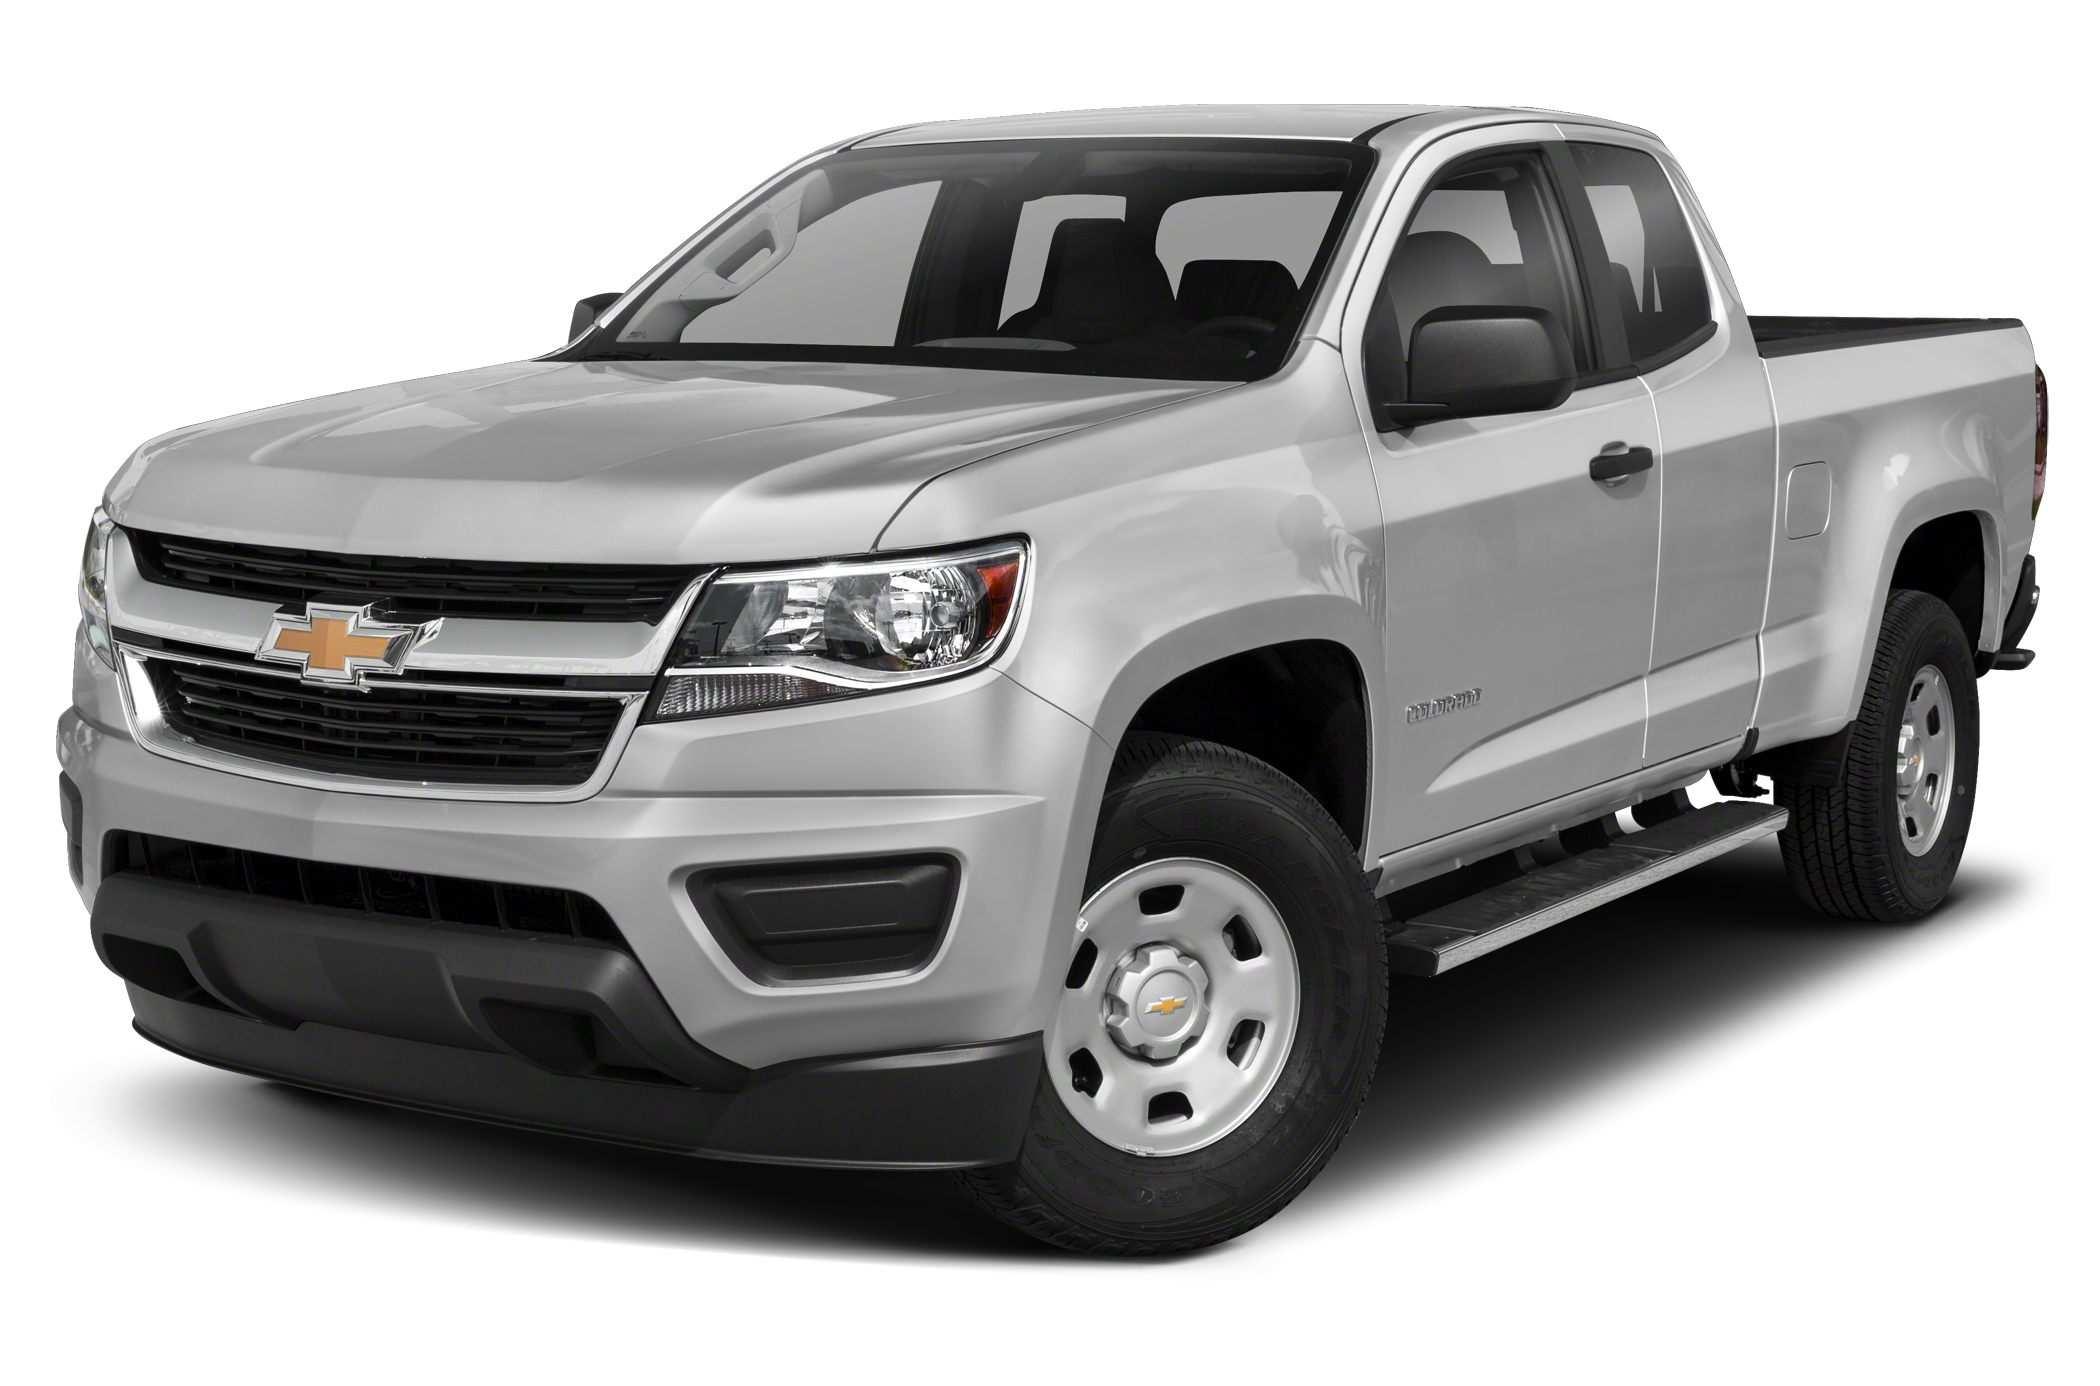 12 The 2019 Chevrolet Colorado New Review with 2019 Chevrolet Colorado